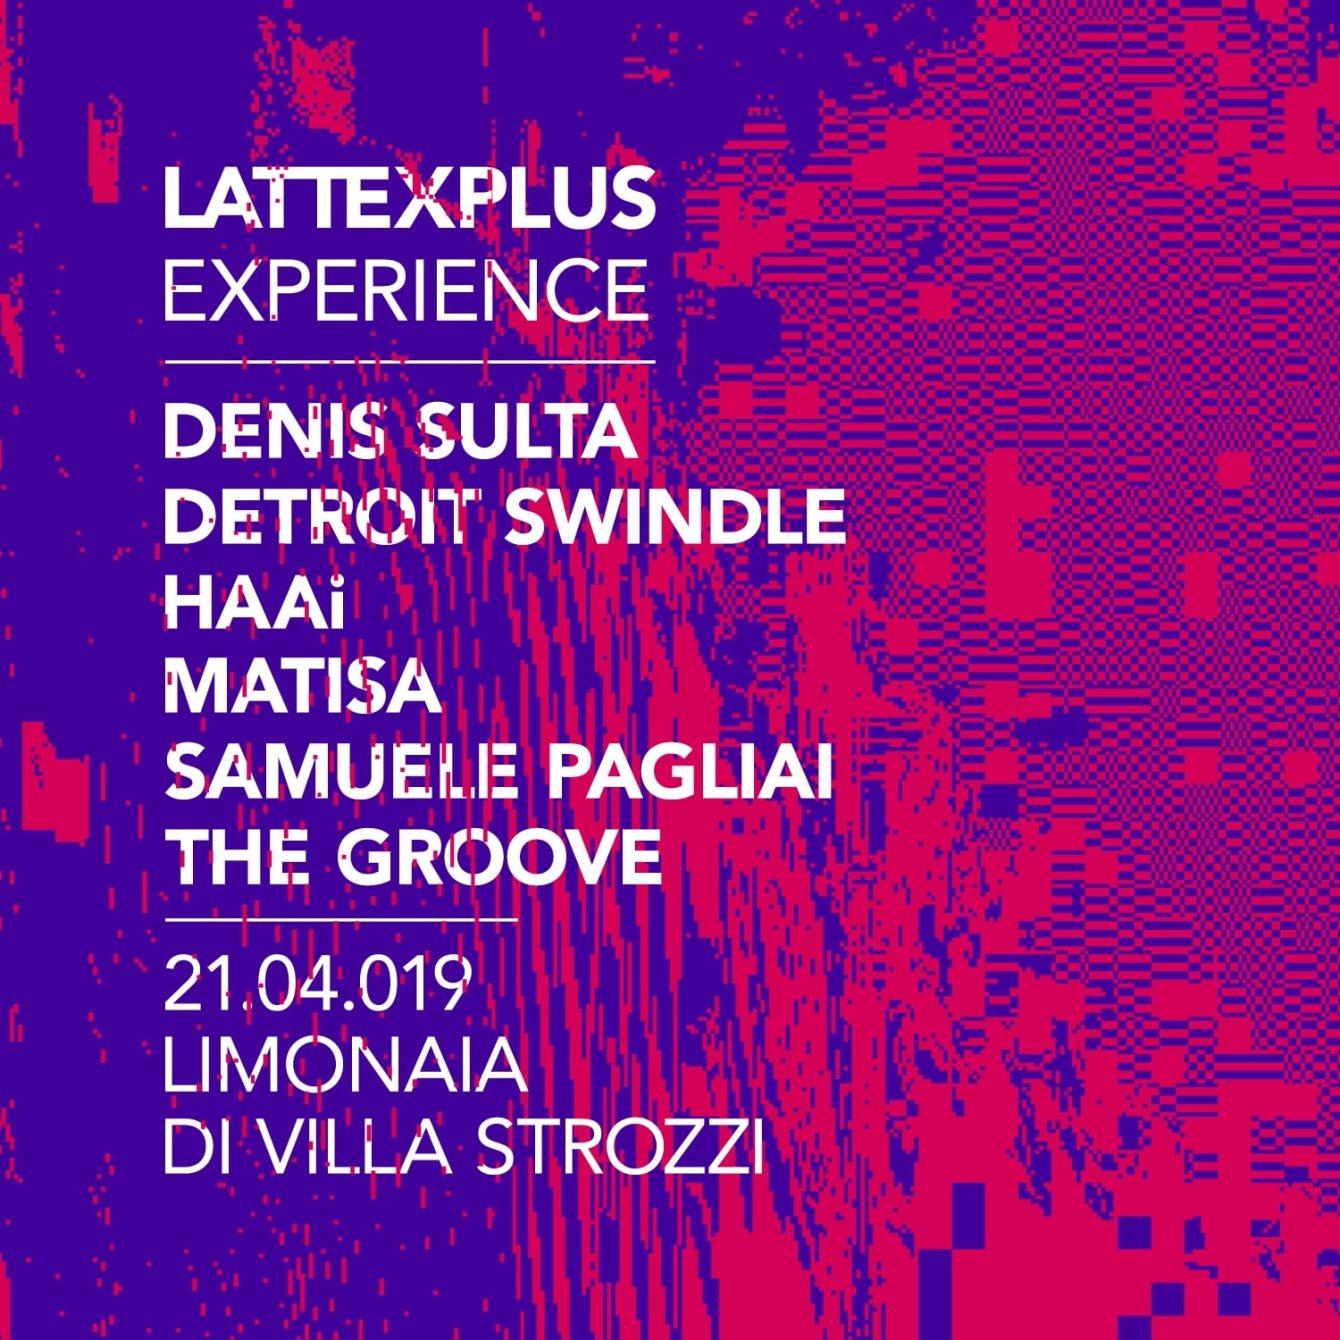 Lattexplus Experience 2019 - Flyer back